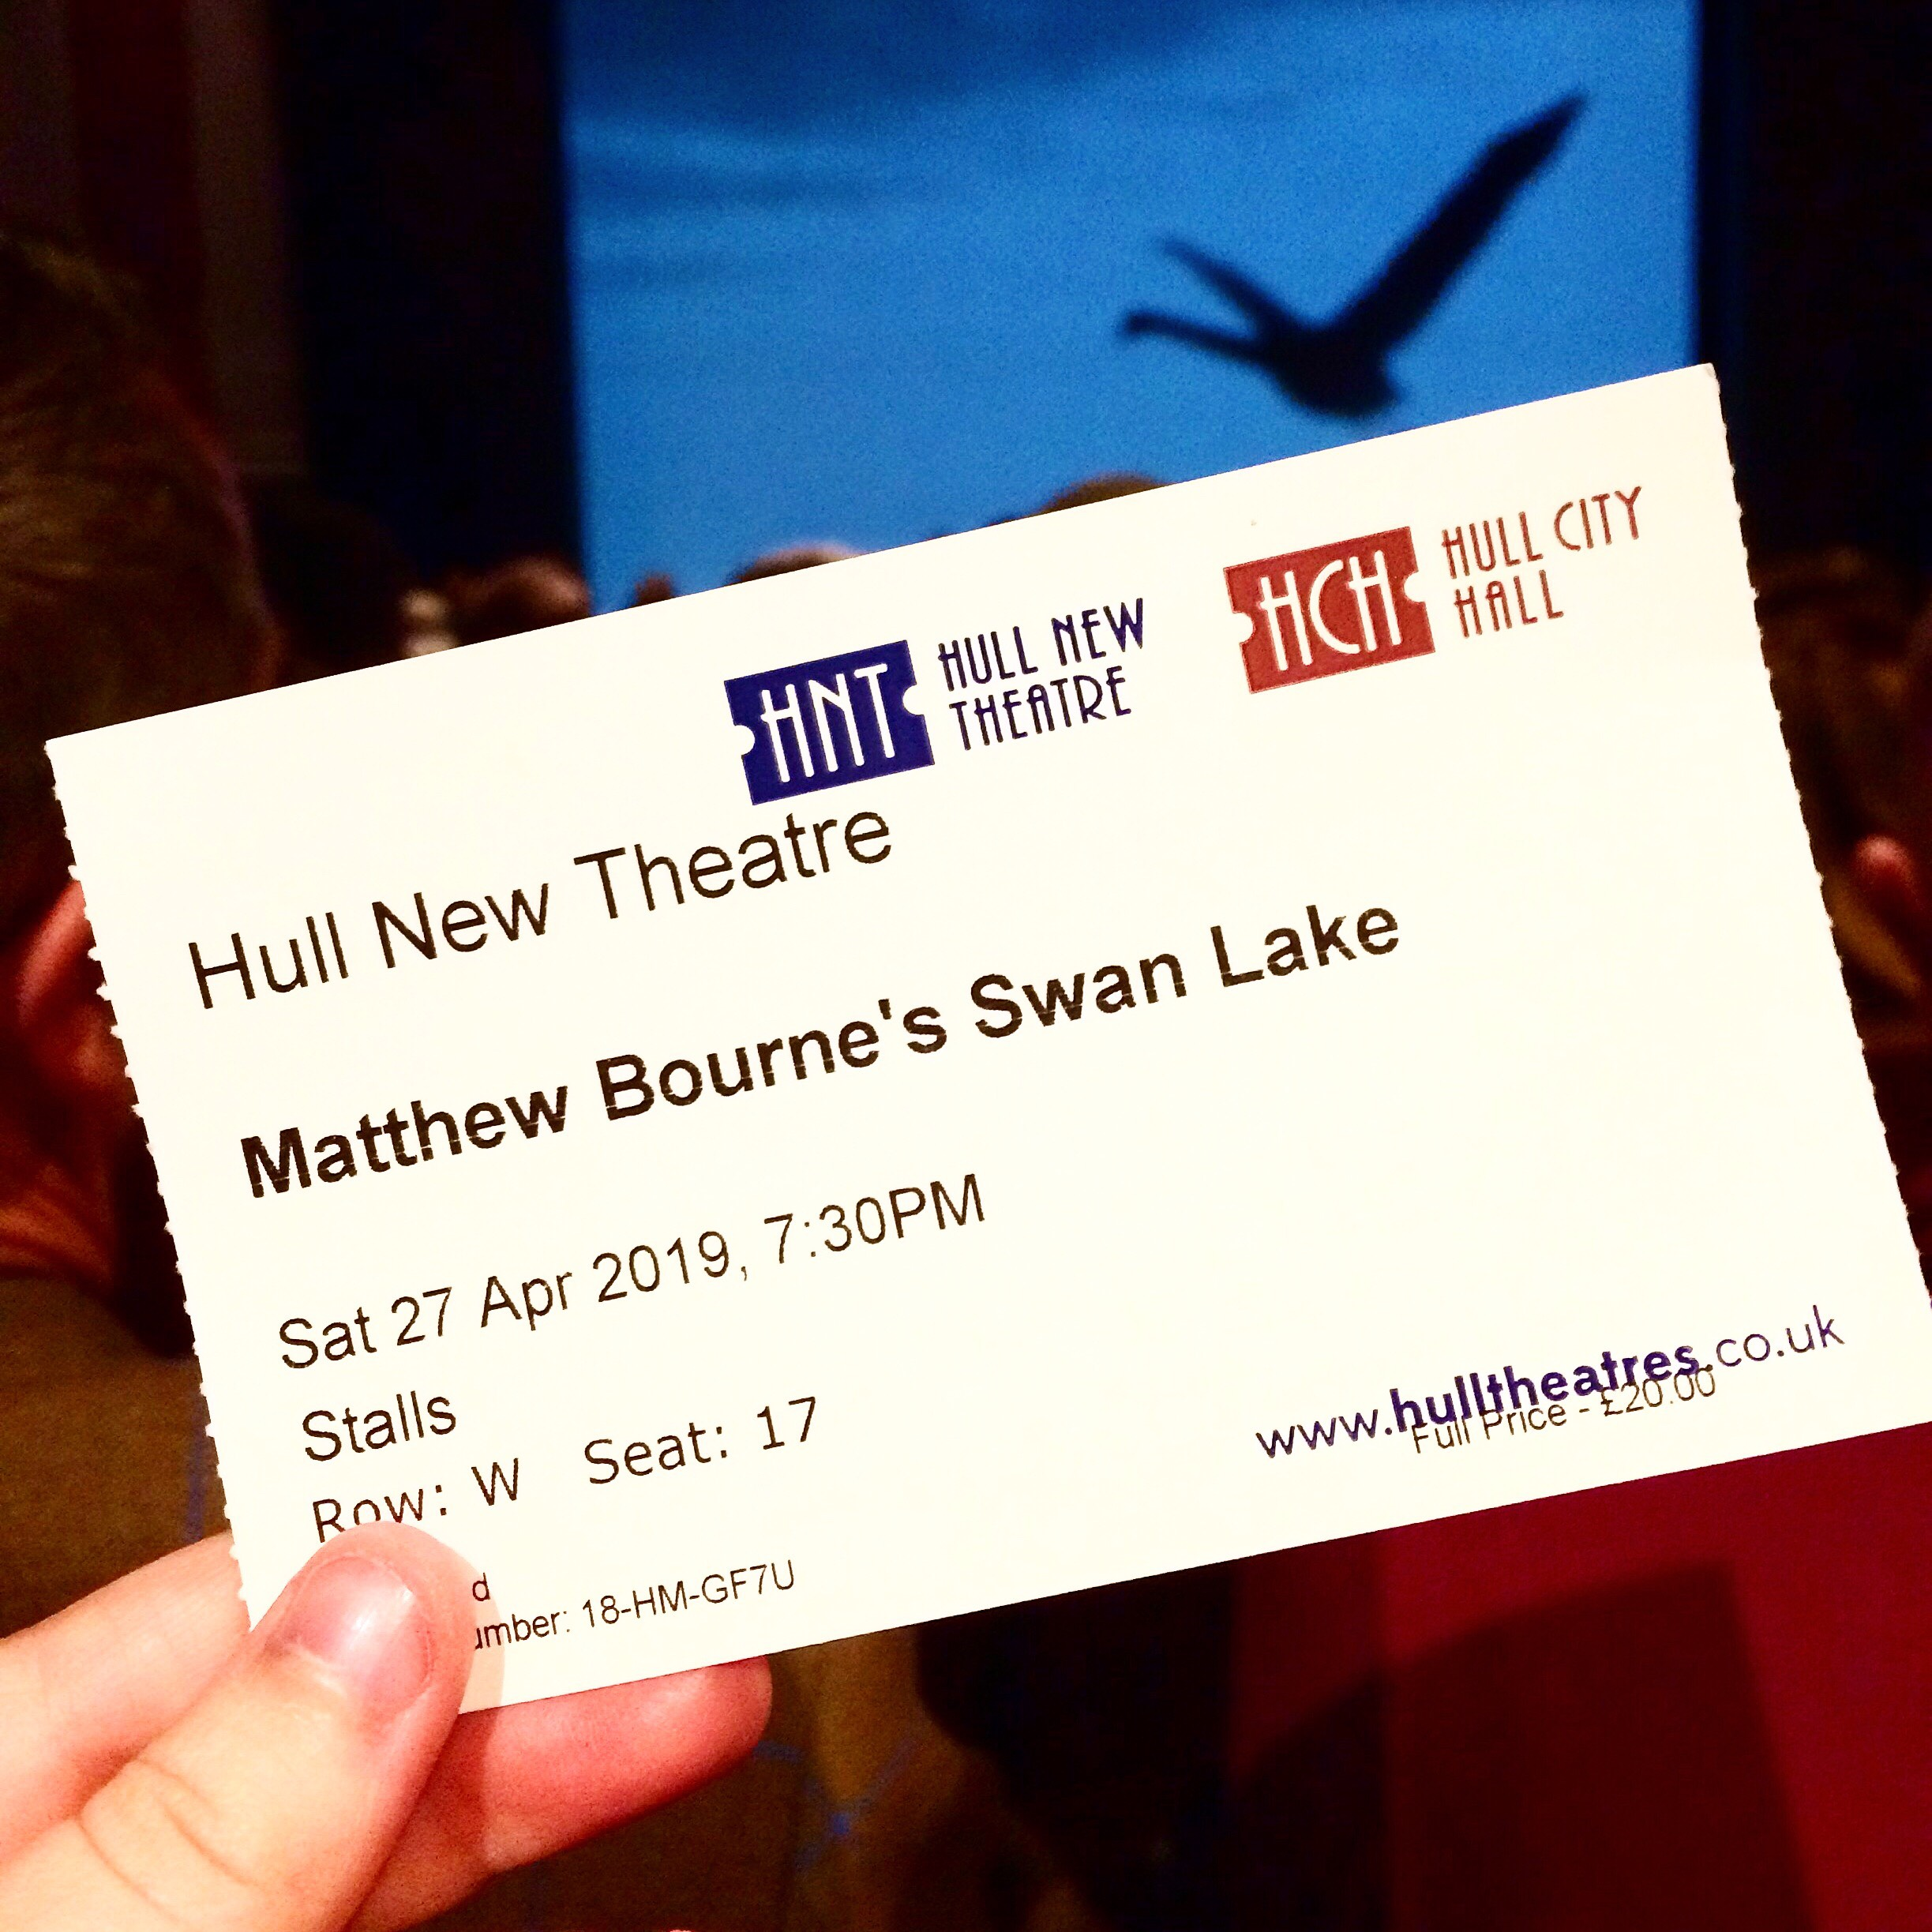 matthew-bournes-swan-lake-ticket